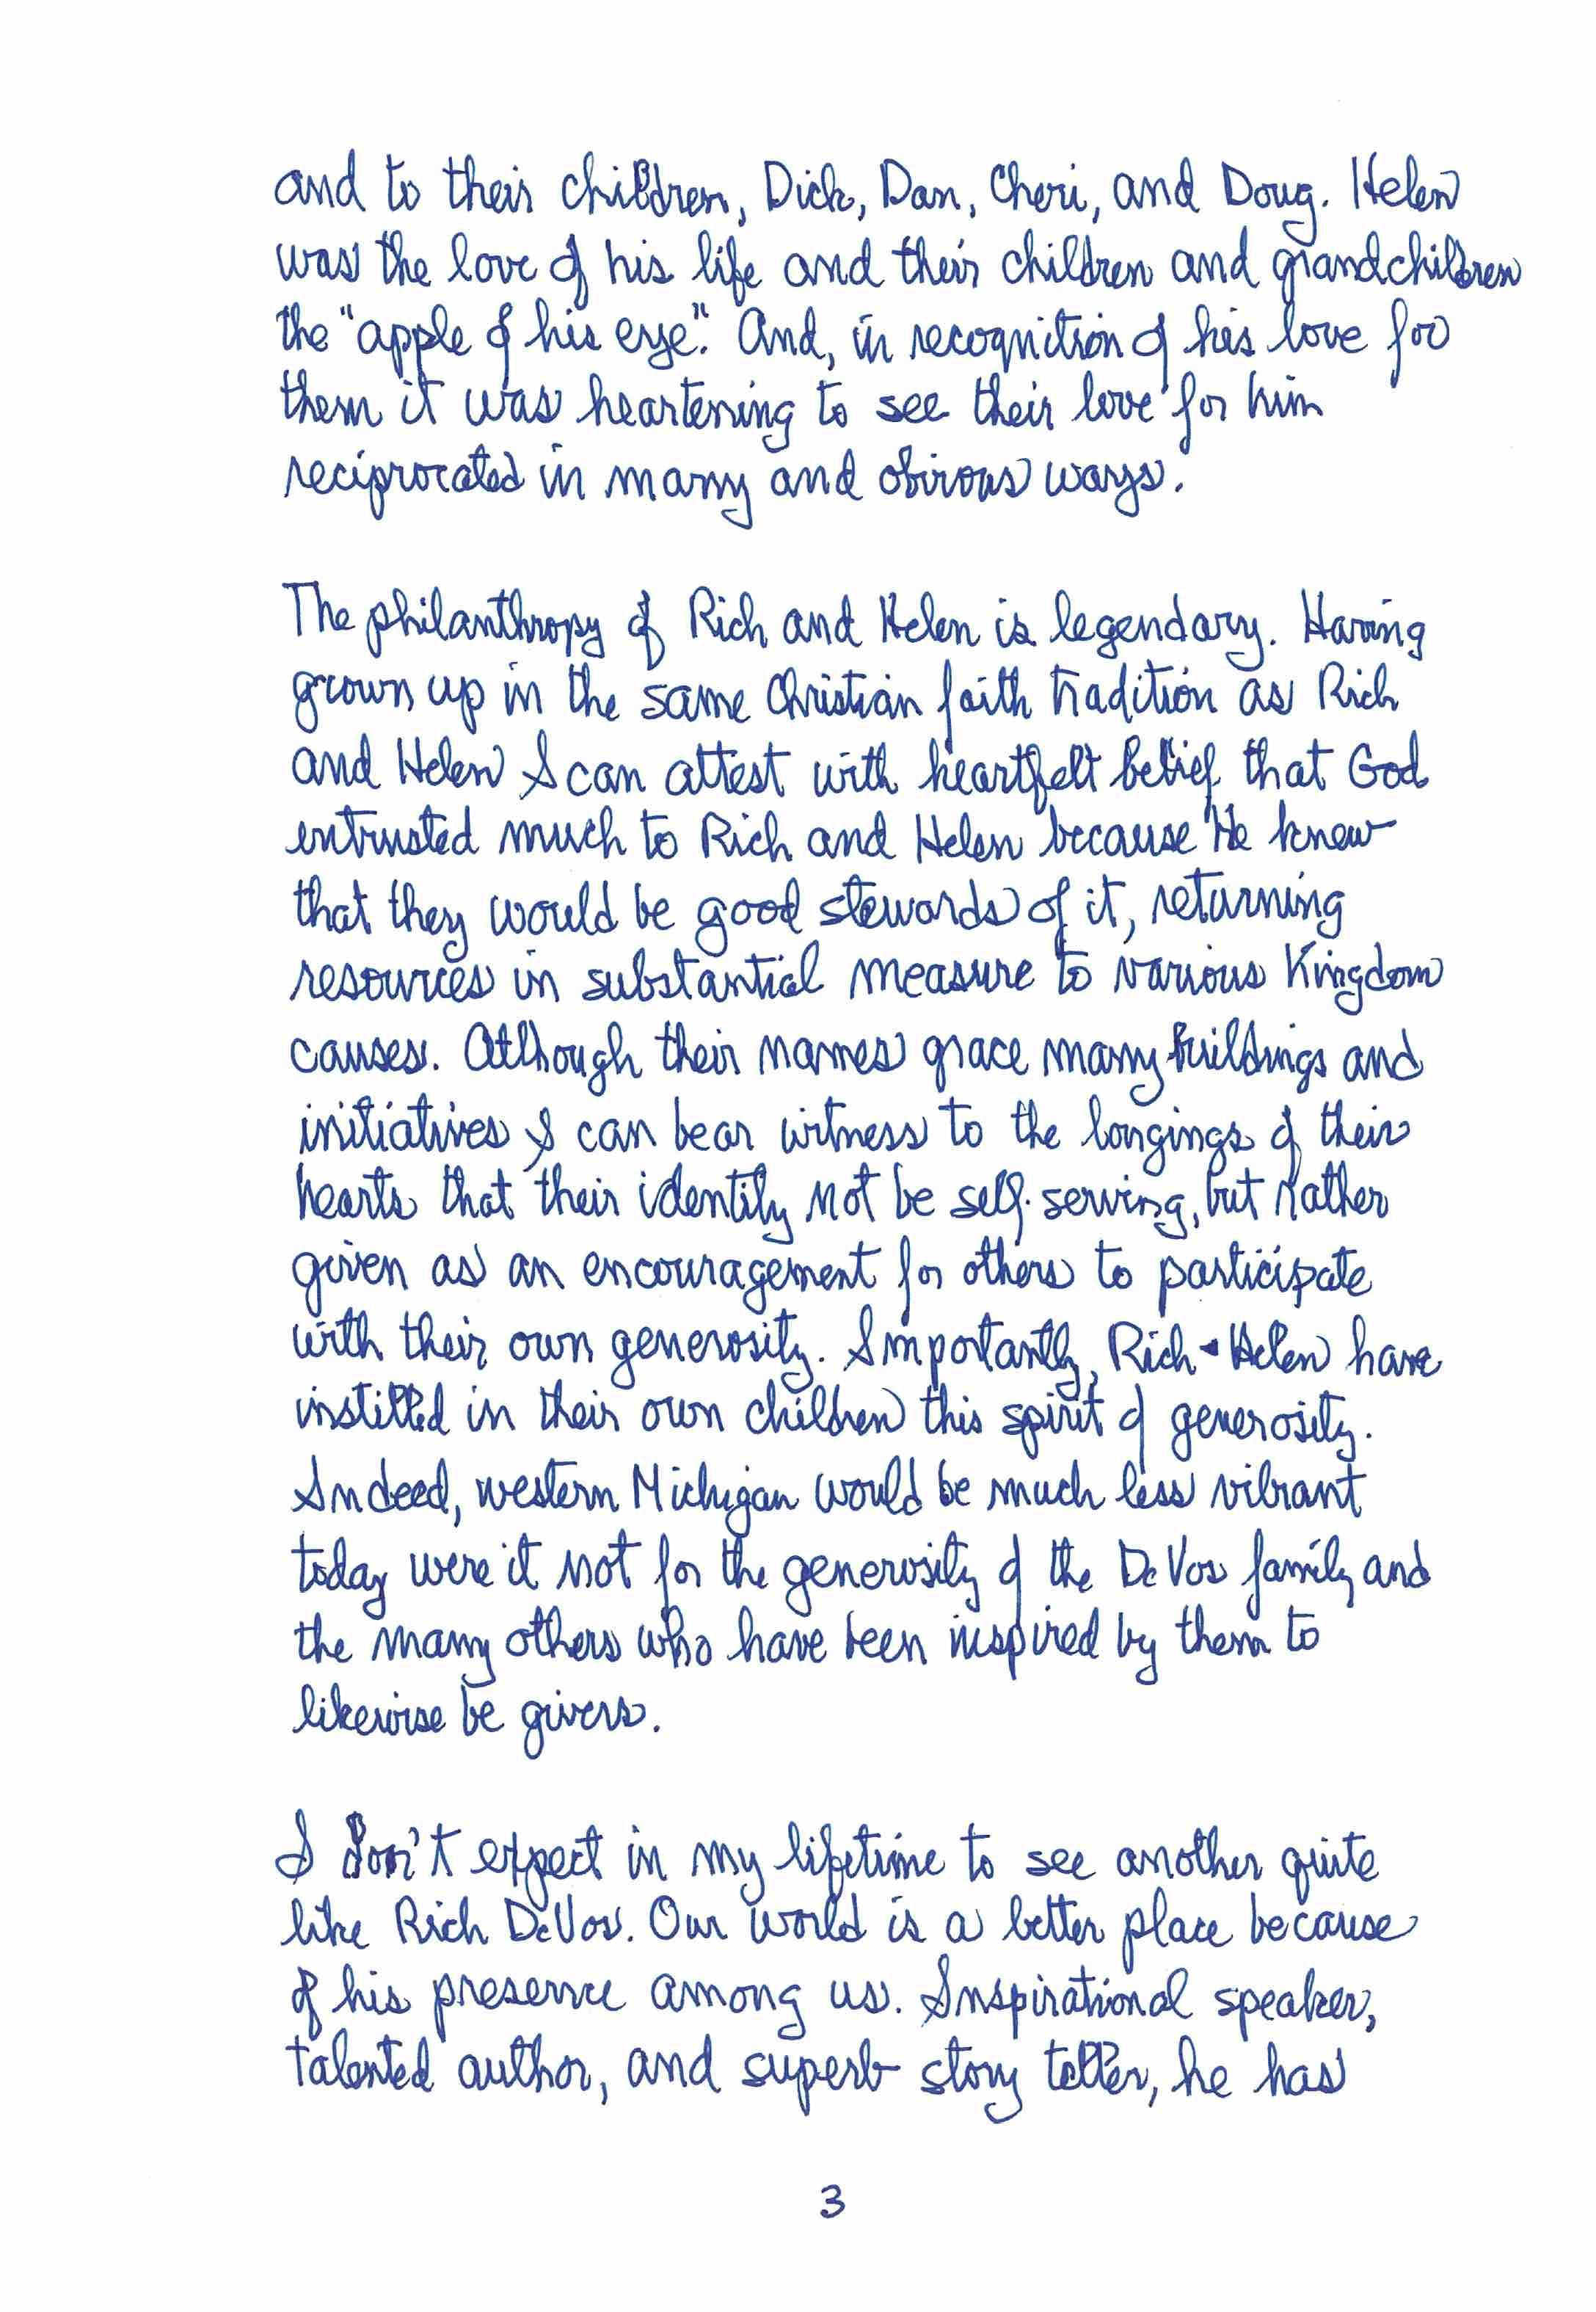 Letter From Dr. James E. Bultman